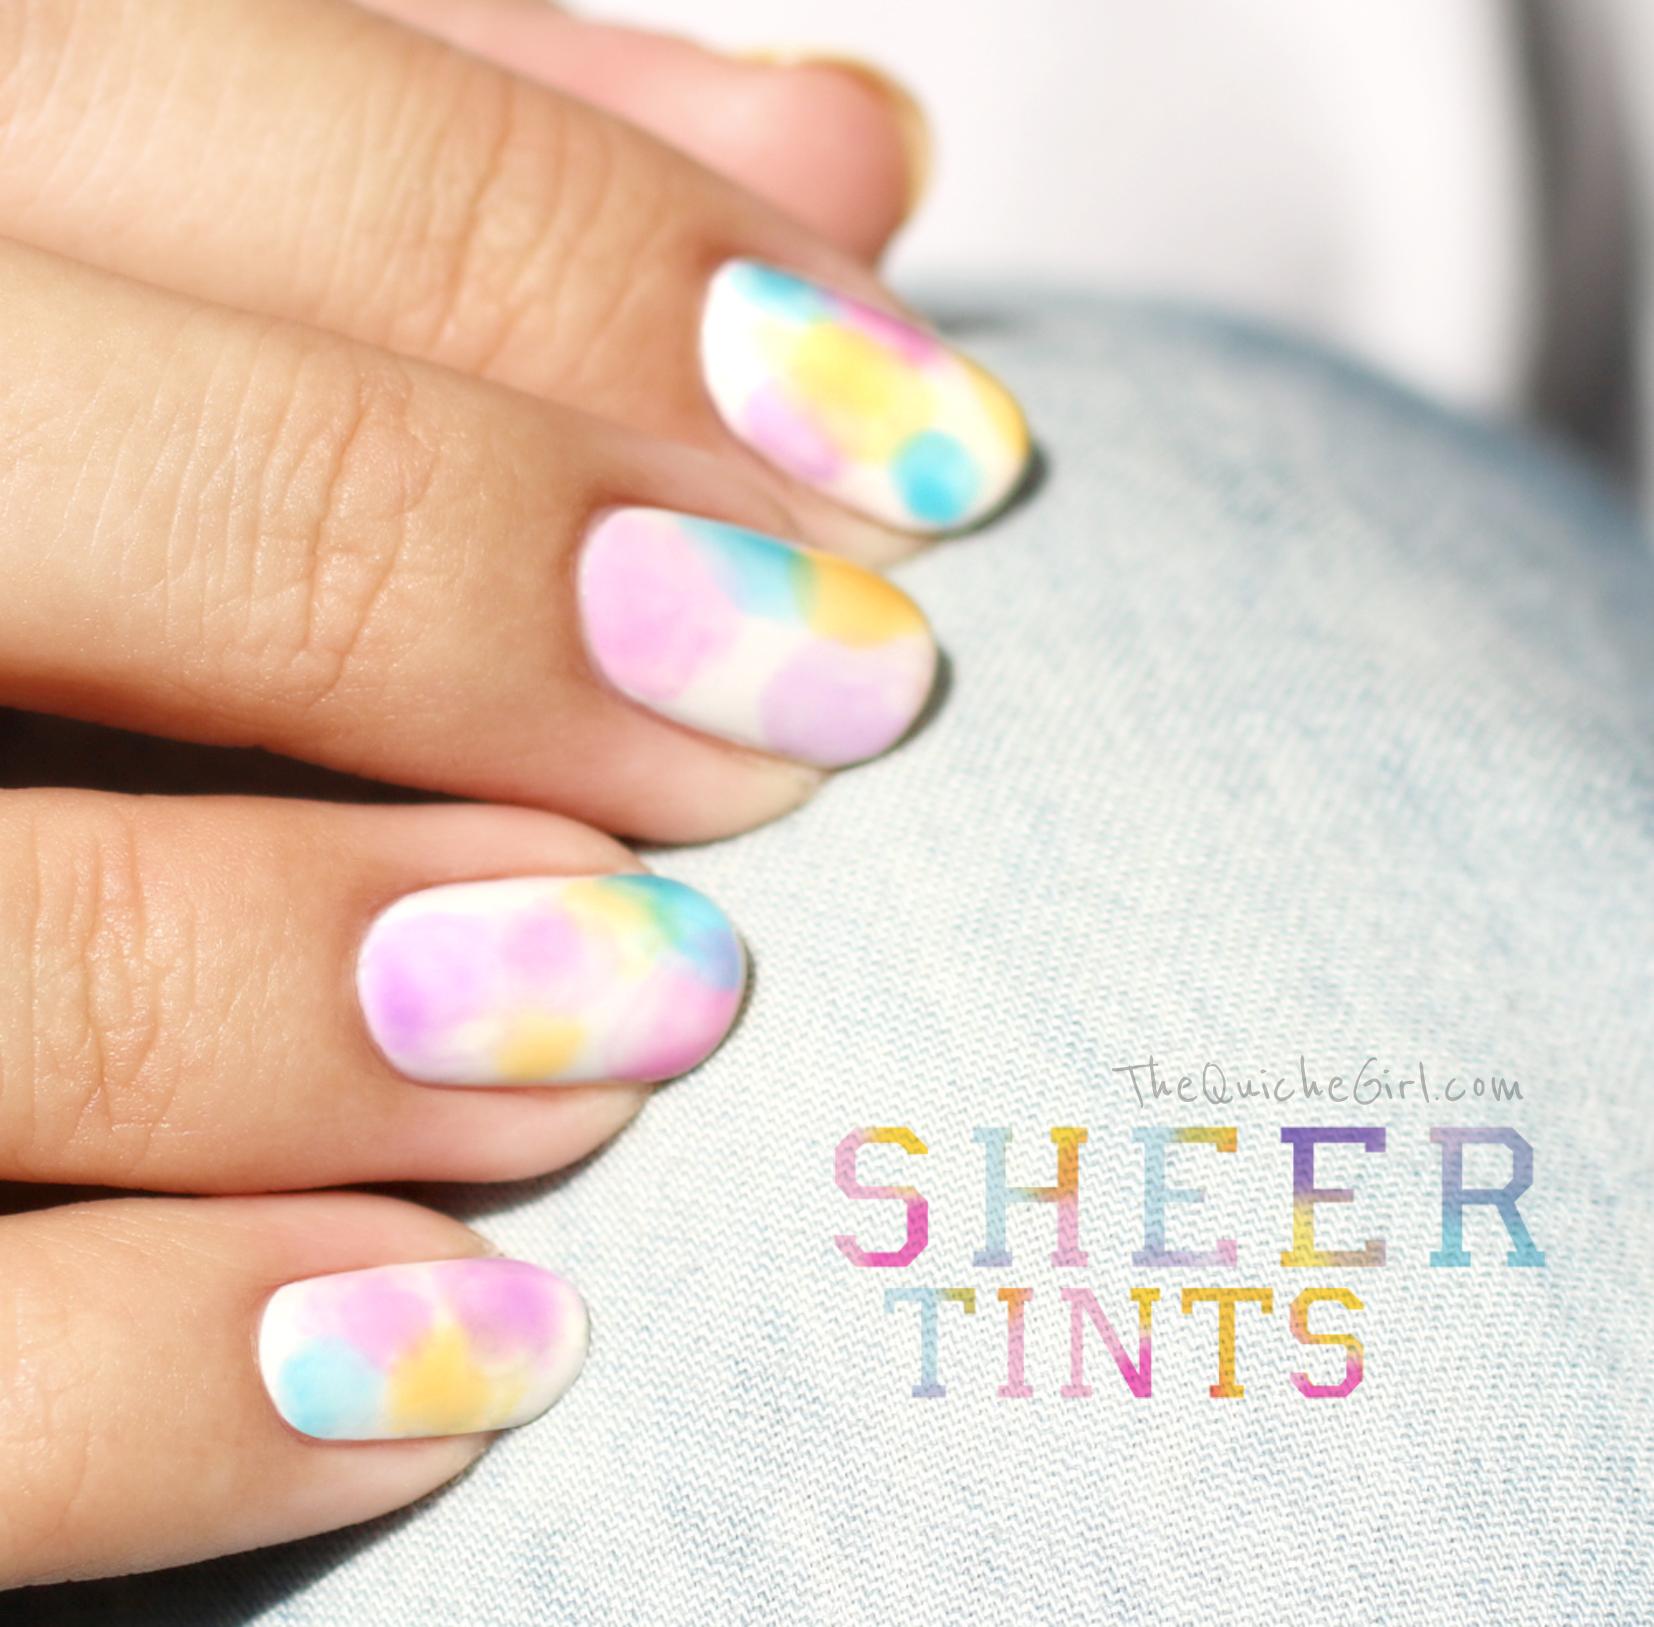 OPI,sheer tints,mini, jelly,QuicheGirl